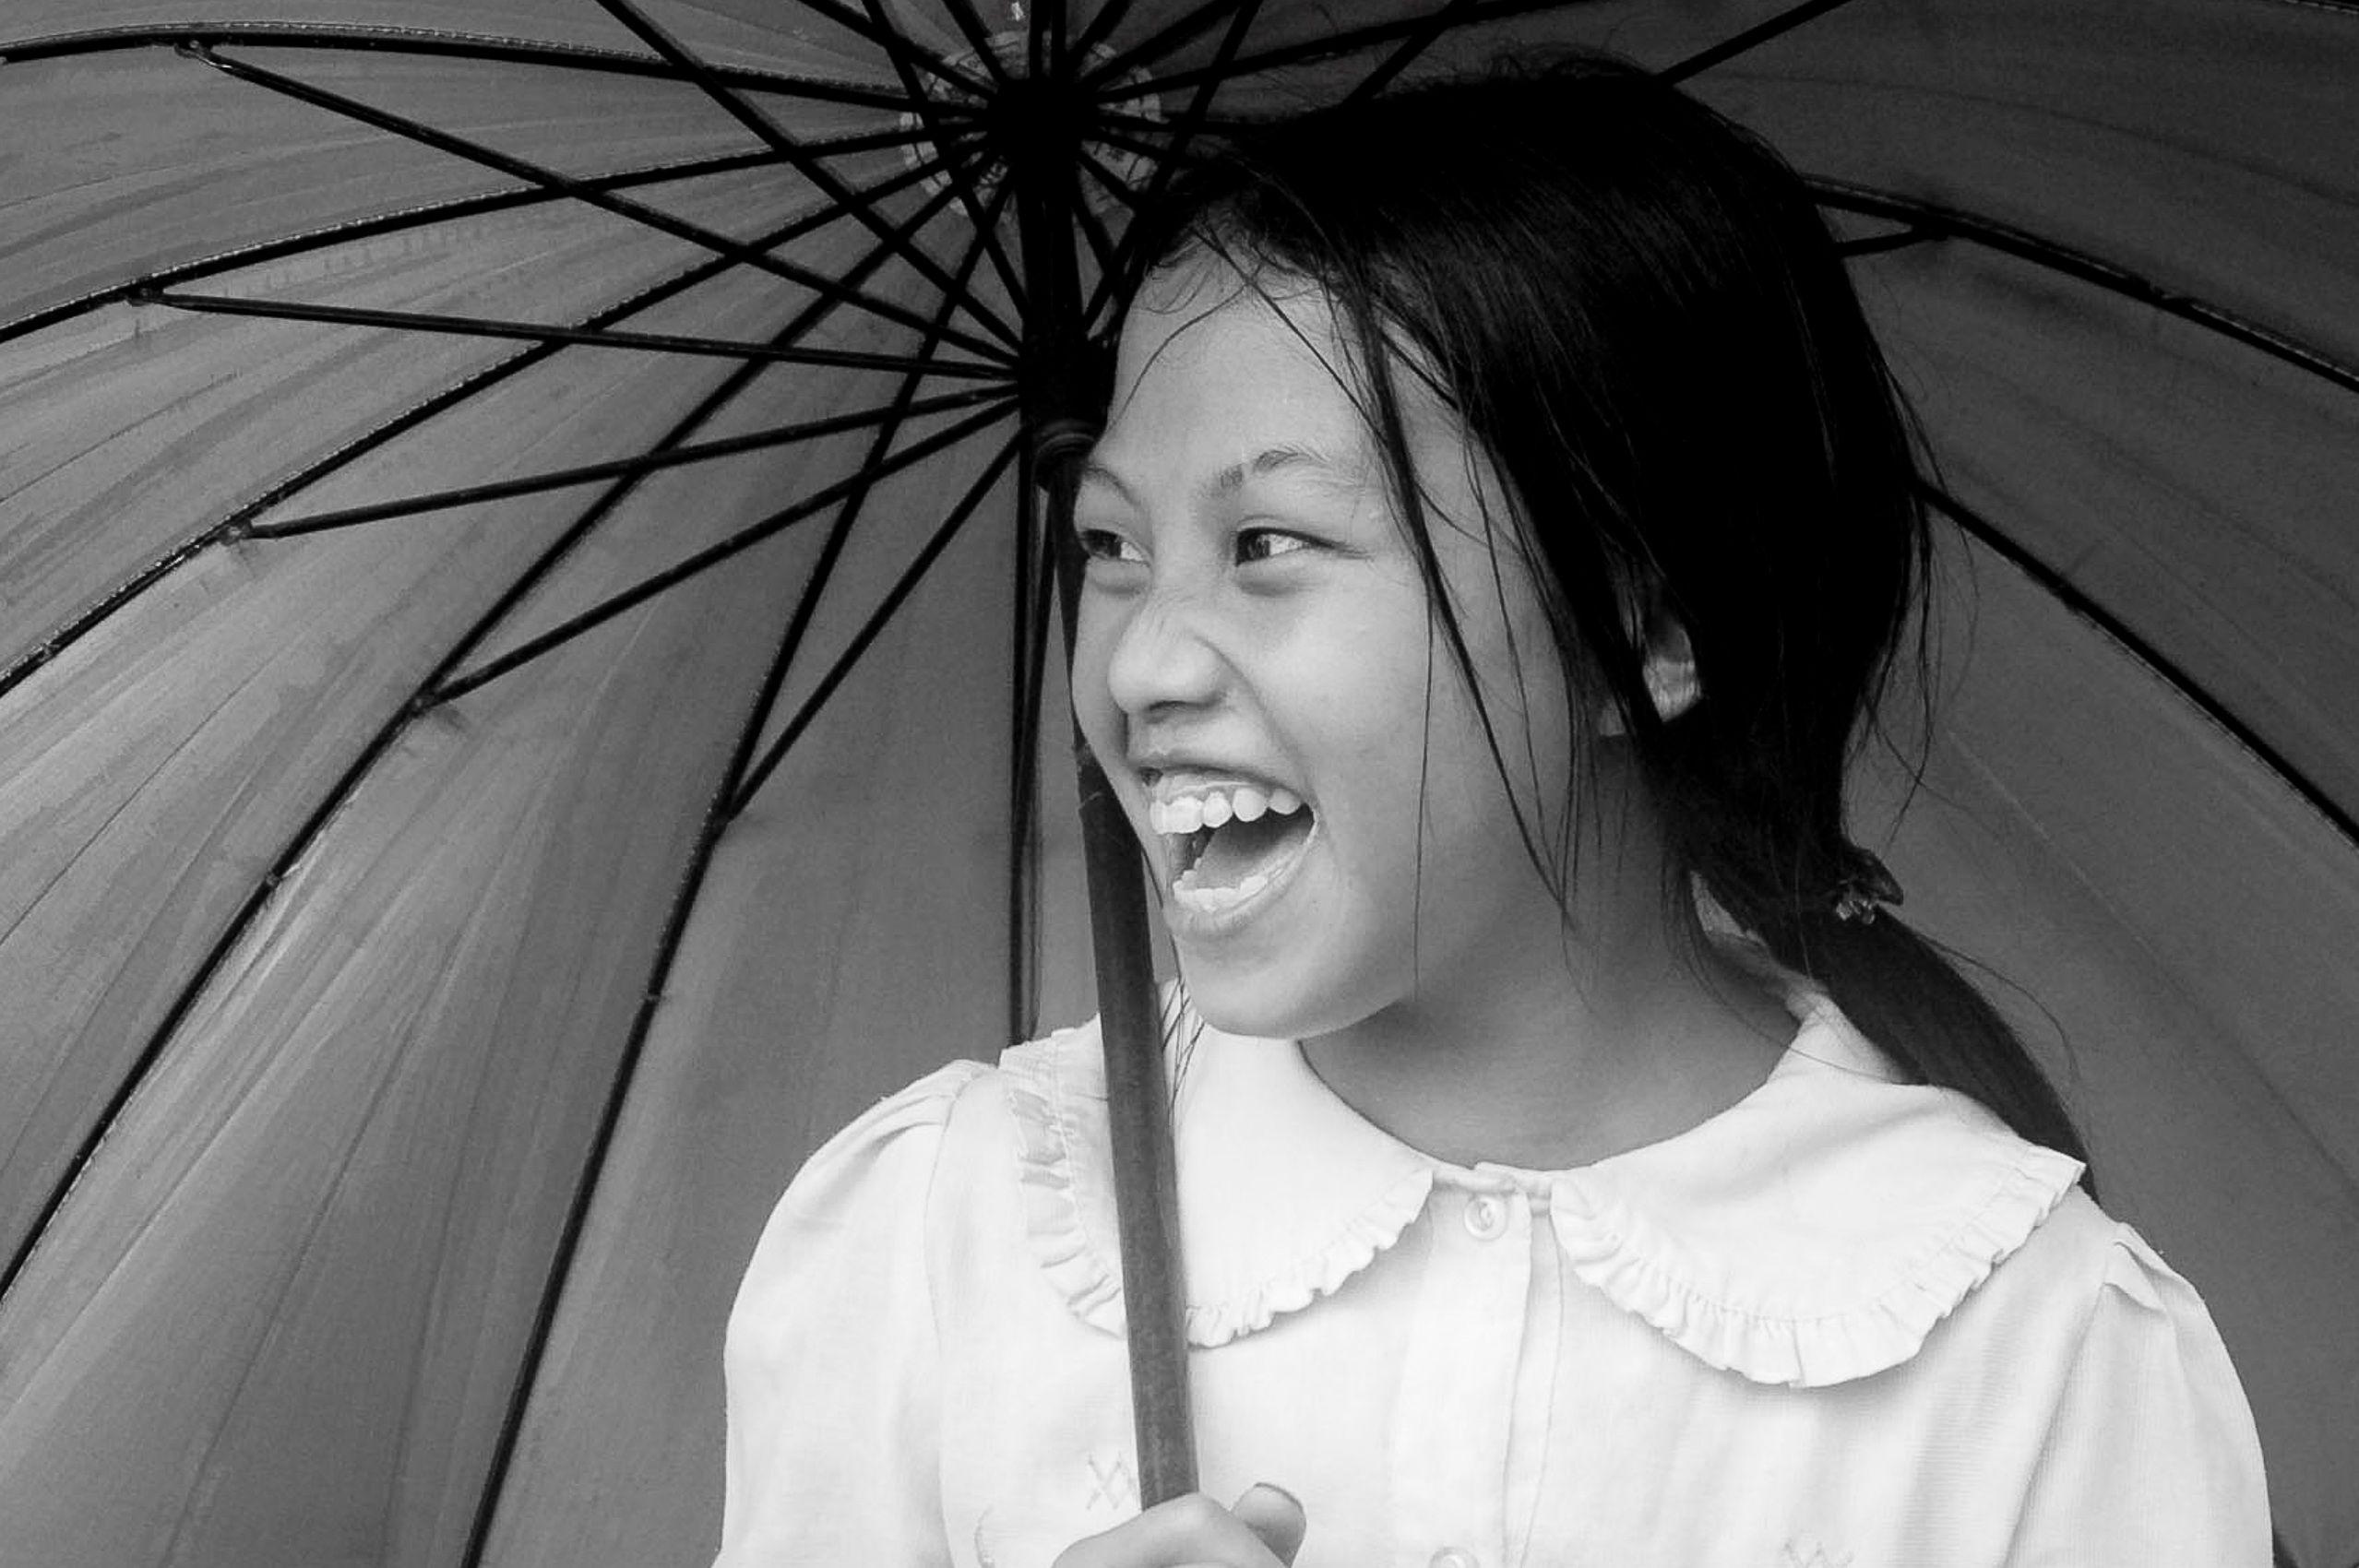 vietnam_hagiang_girl_umbrella_portrait.jpg